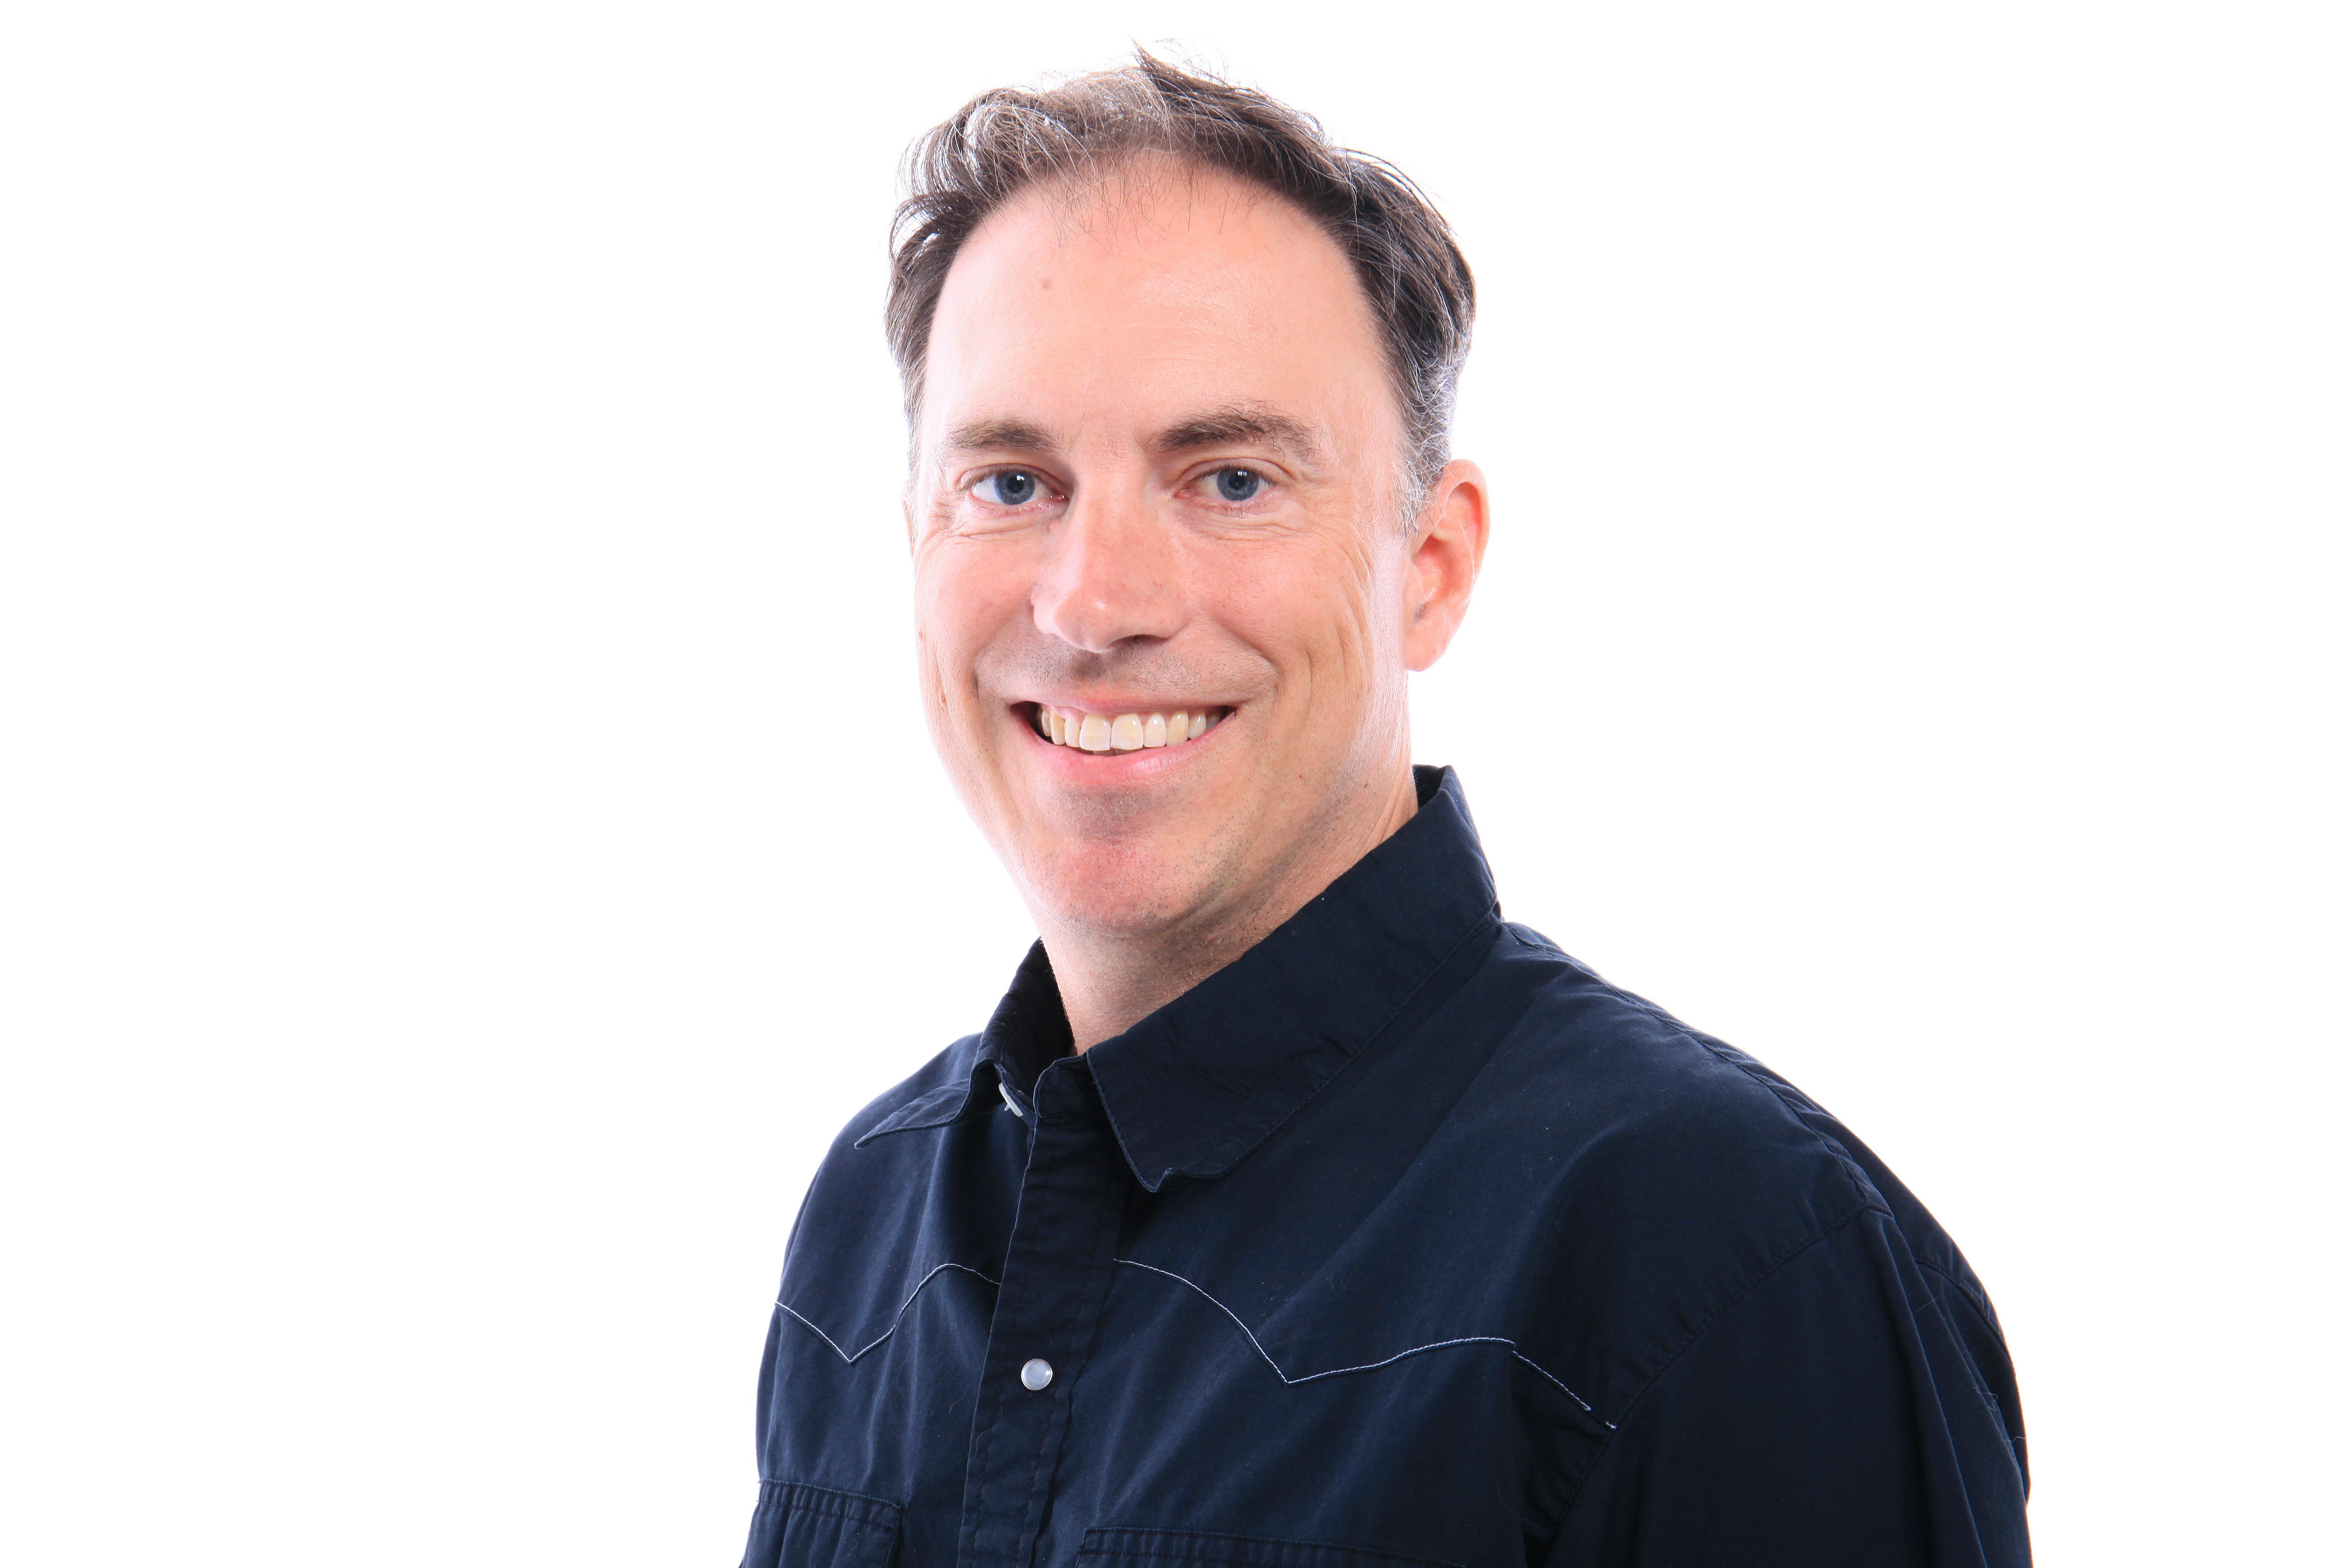 Craig Dalton